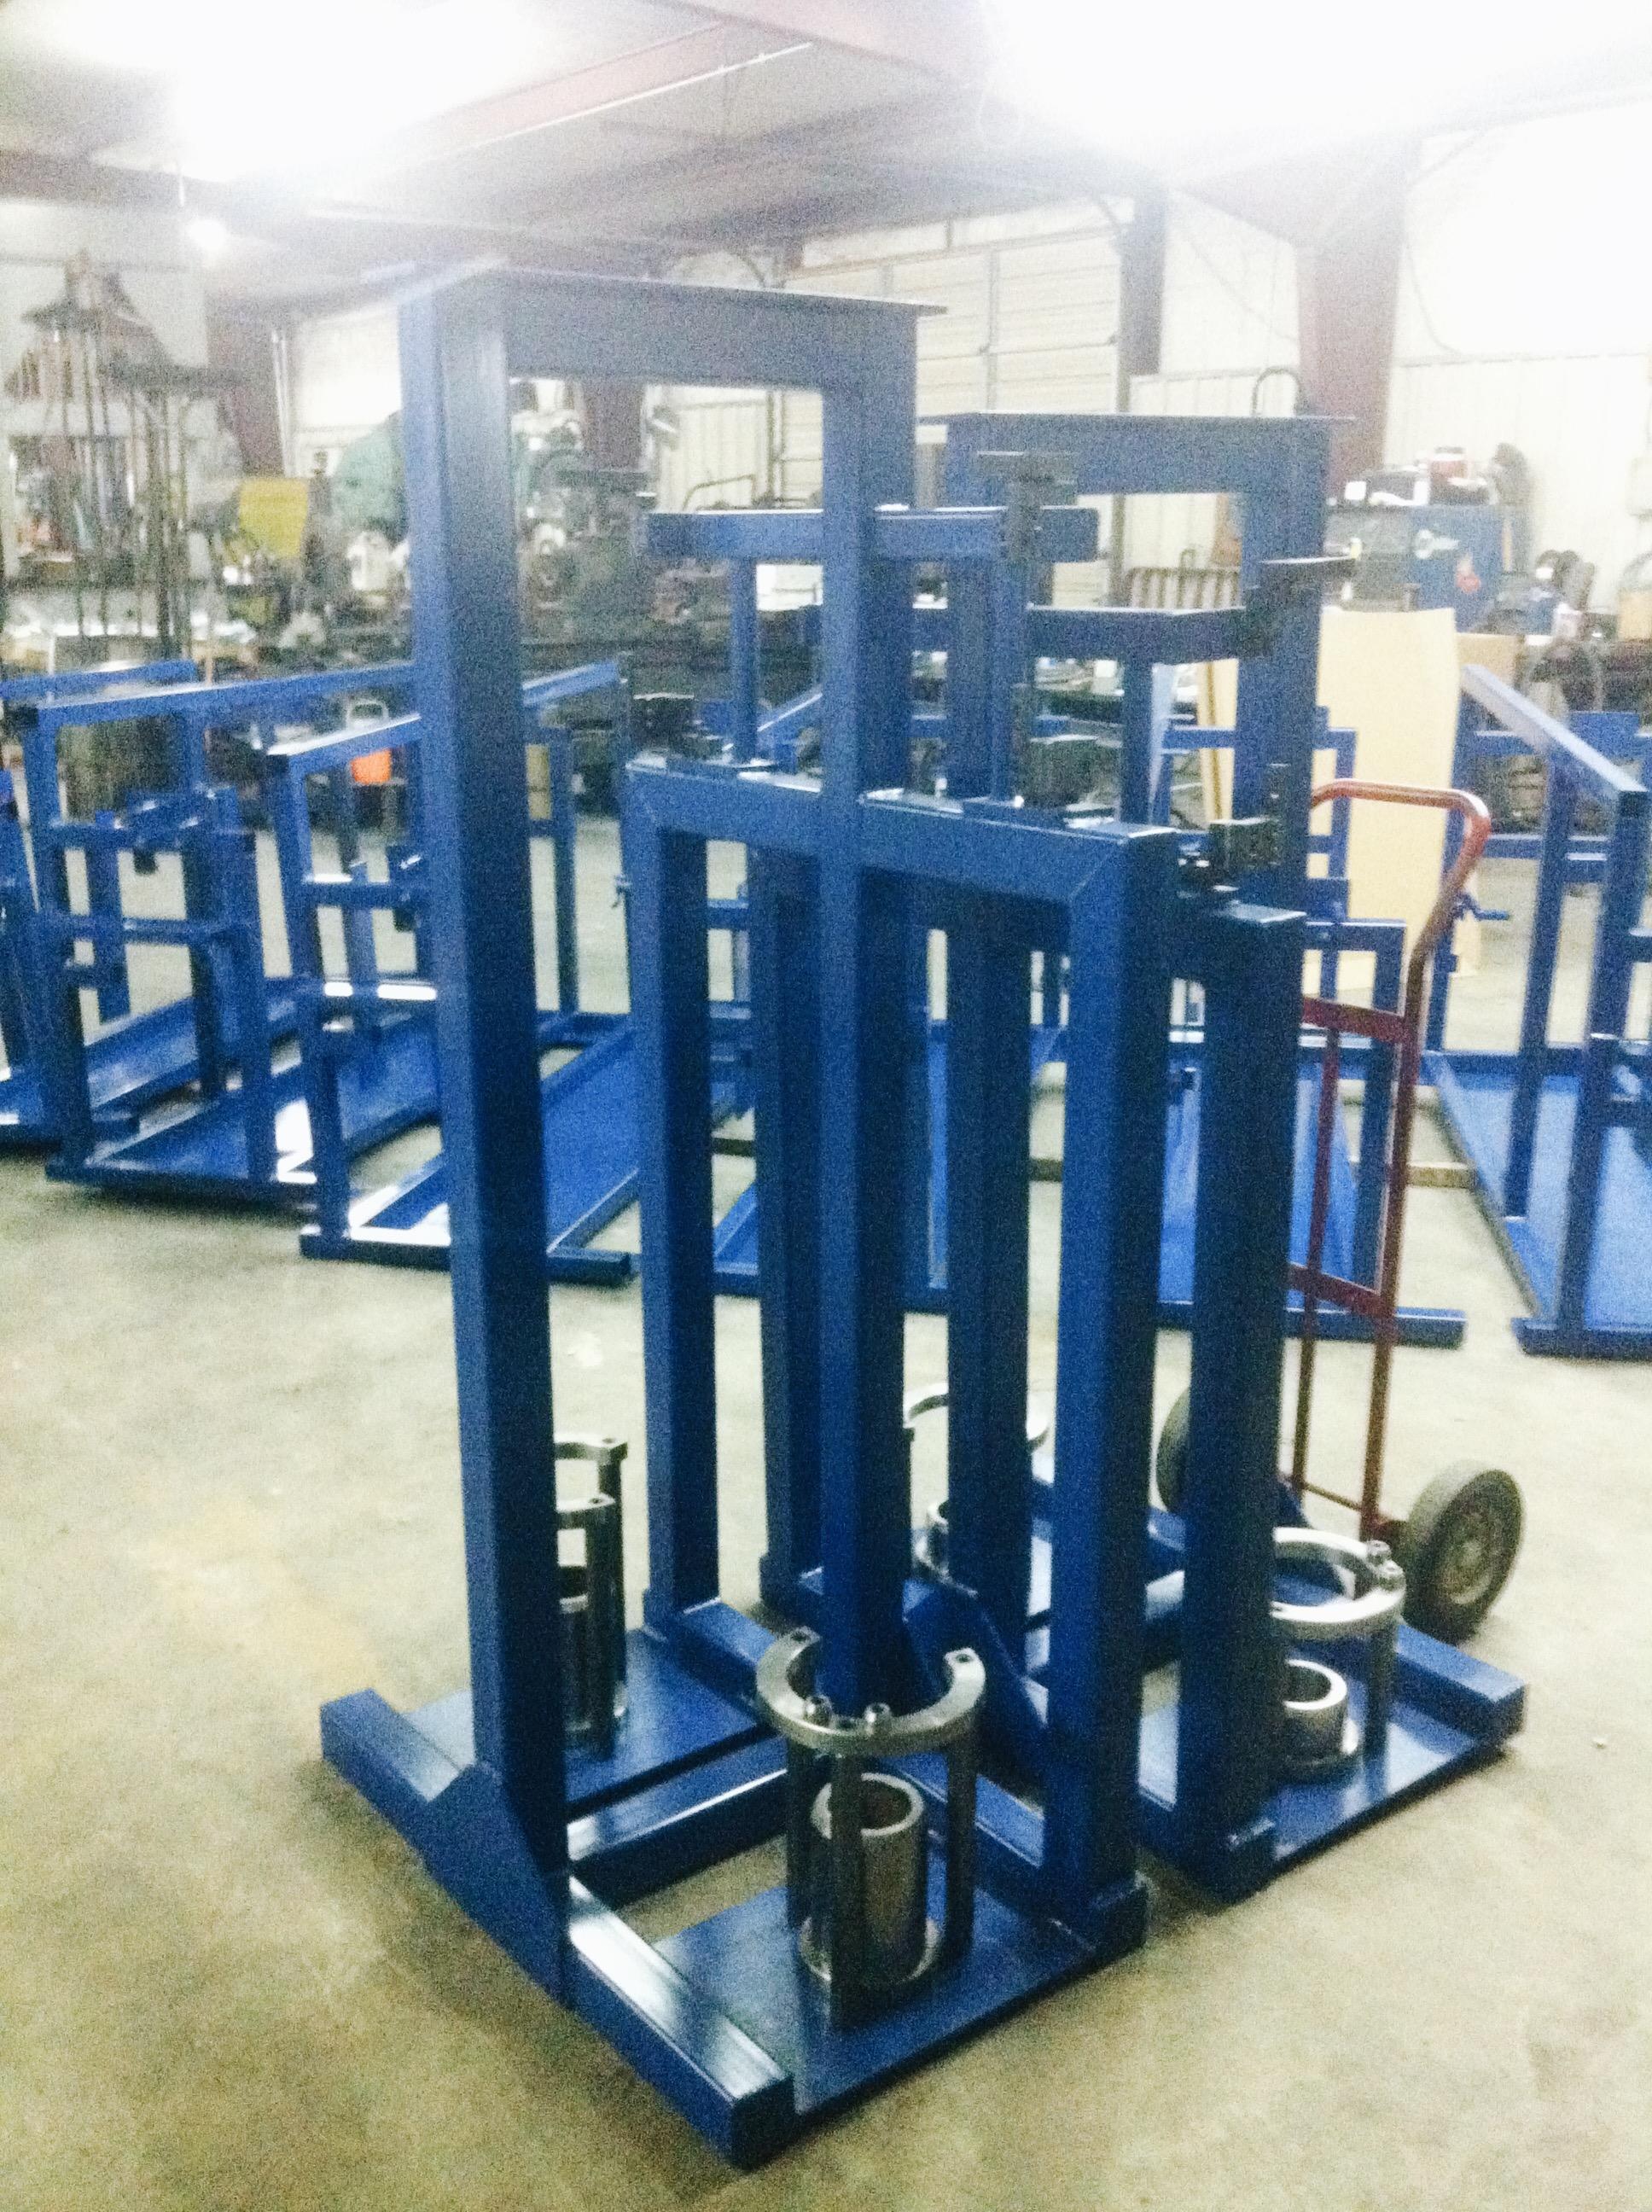 Texas Industrial 12 Assembly Fixtures.JPG